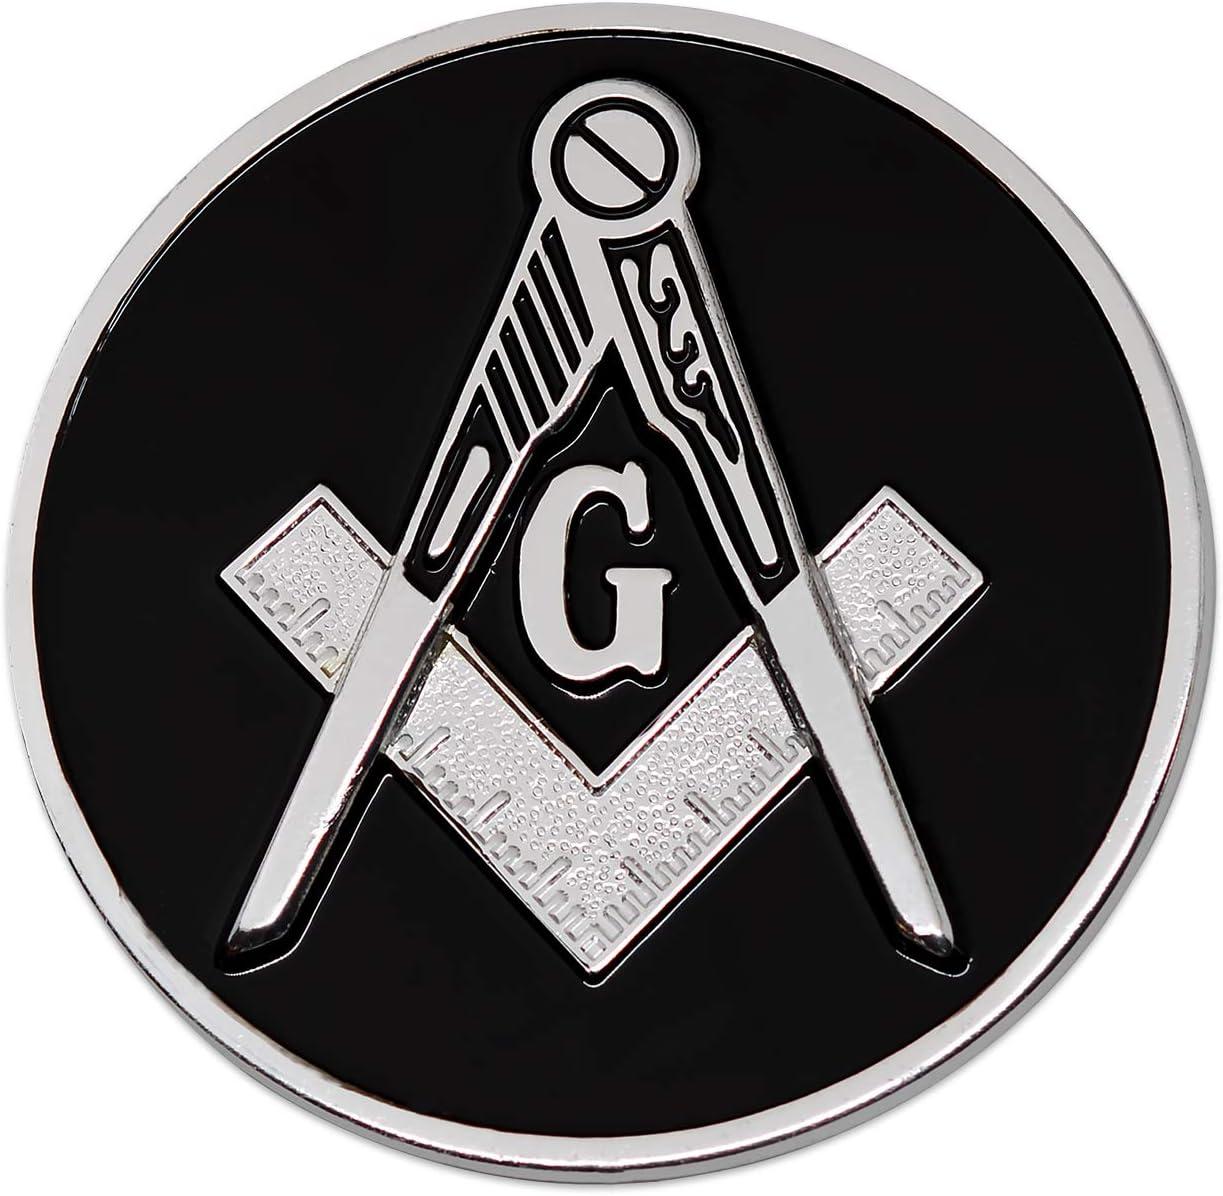 Classic Blue Master Mason Freemasonry Adhesive Auto Car Emblem Metal Badge Decal